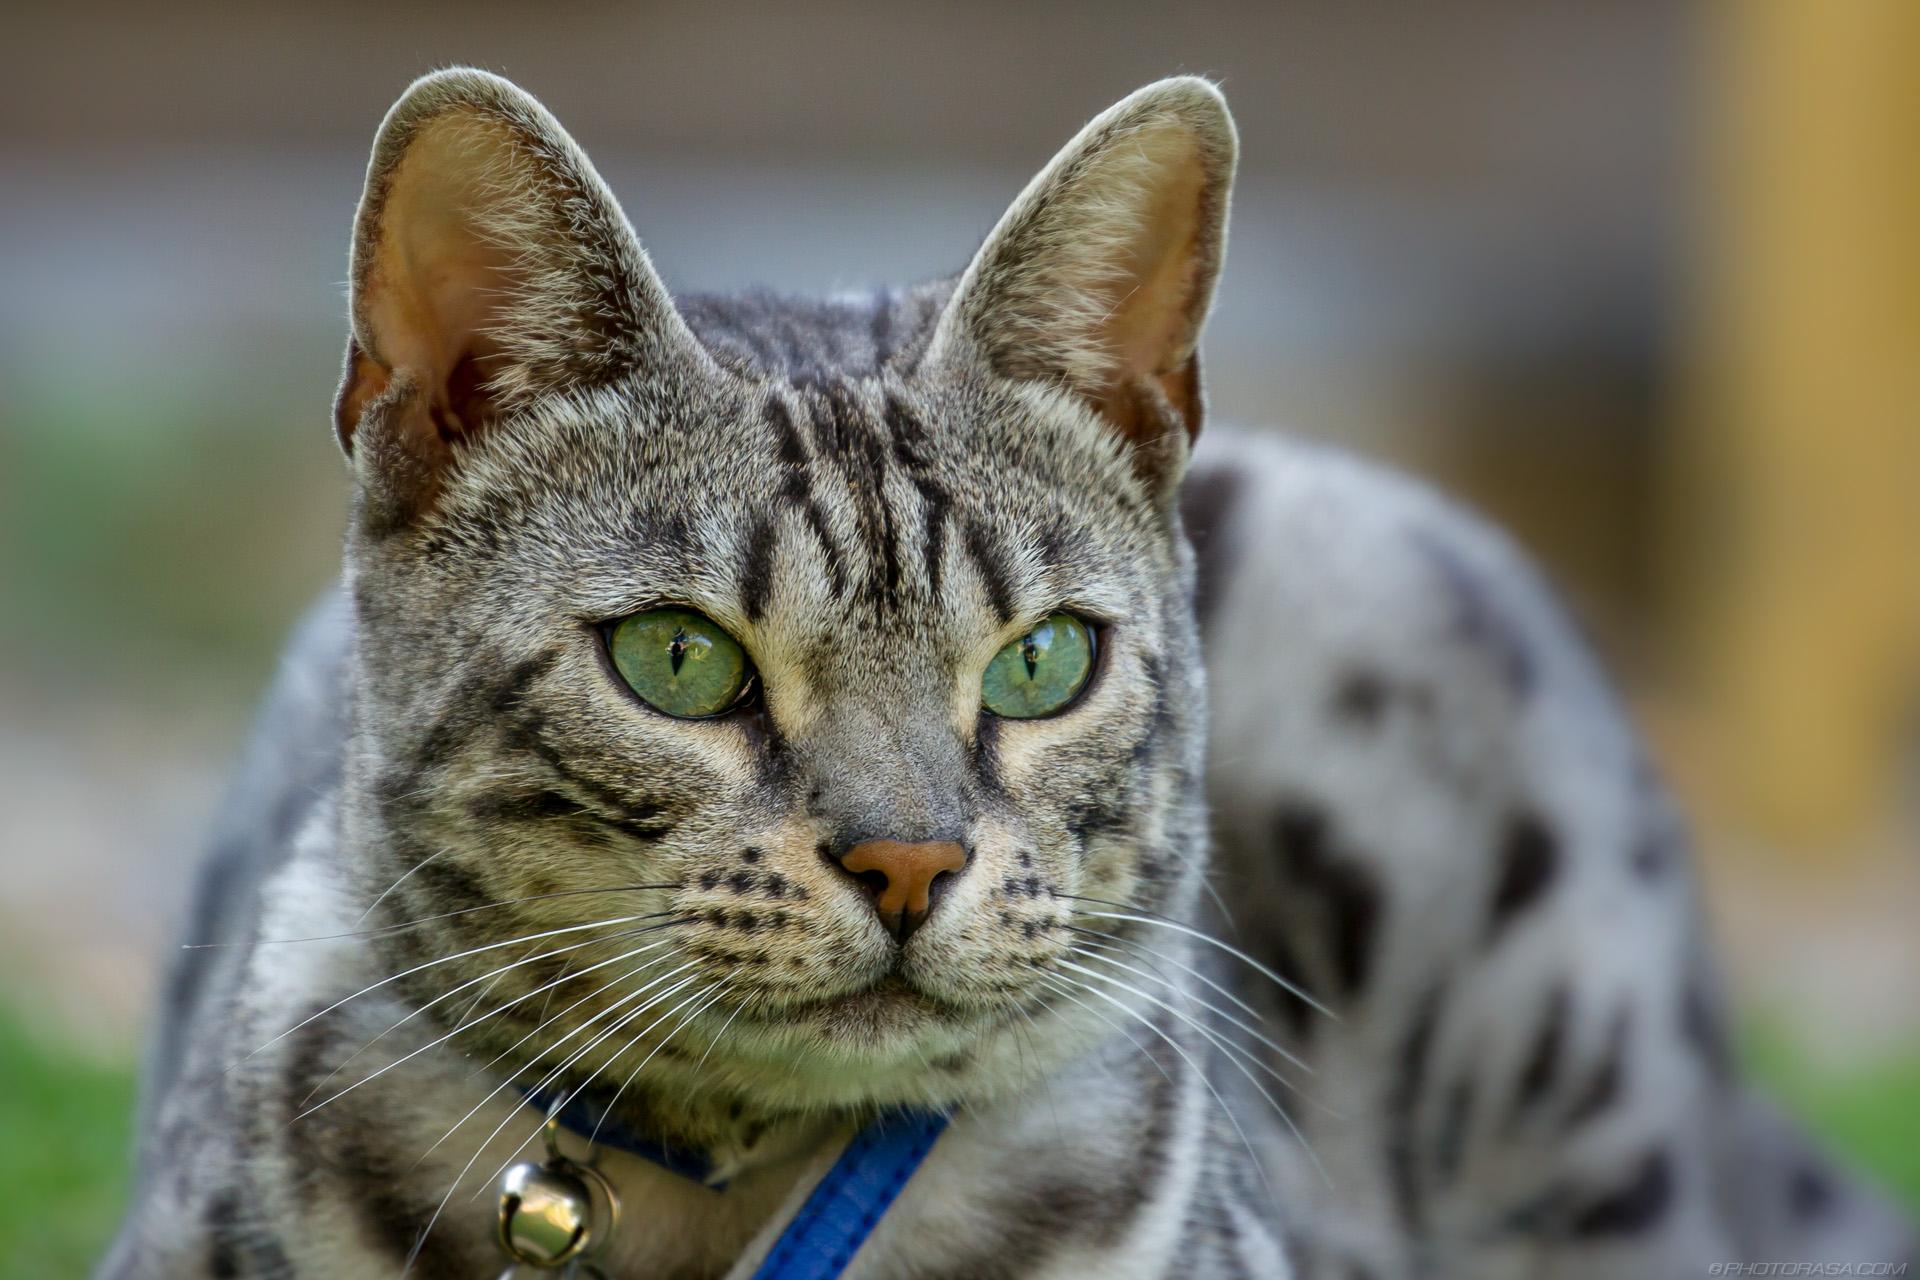 https://photorasa.com/silver-tabby-cat/head-of-silver-tabby-cat/